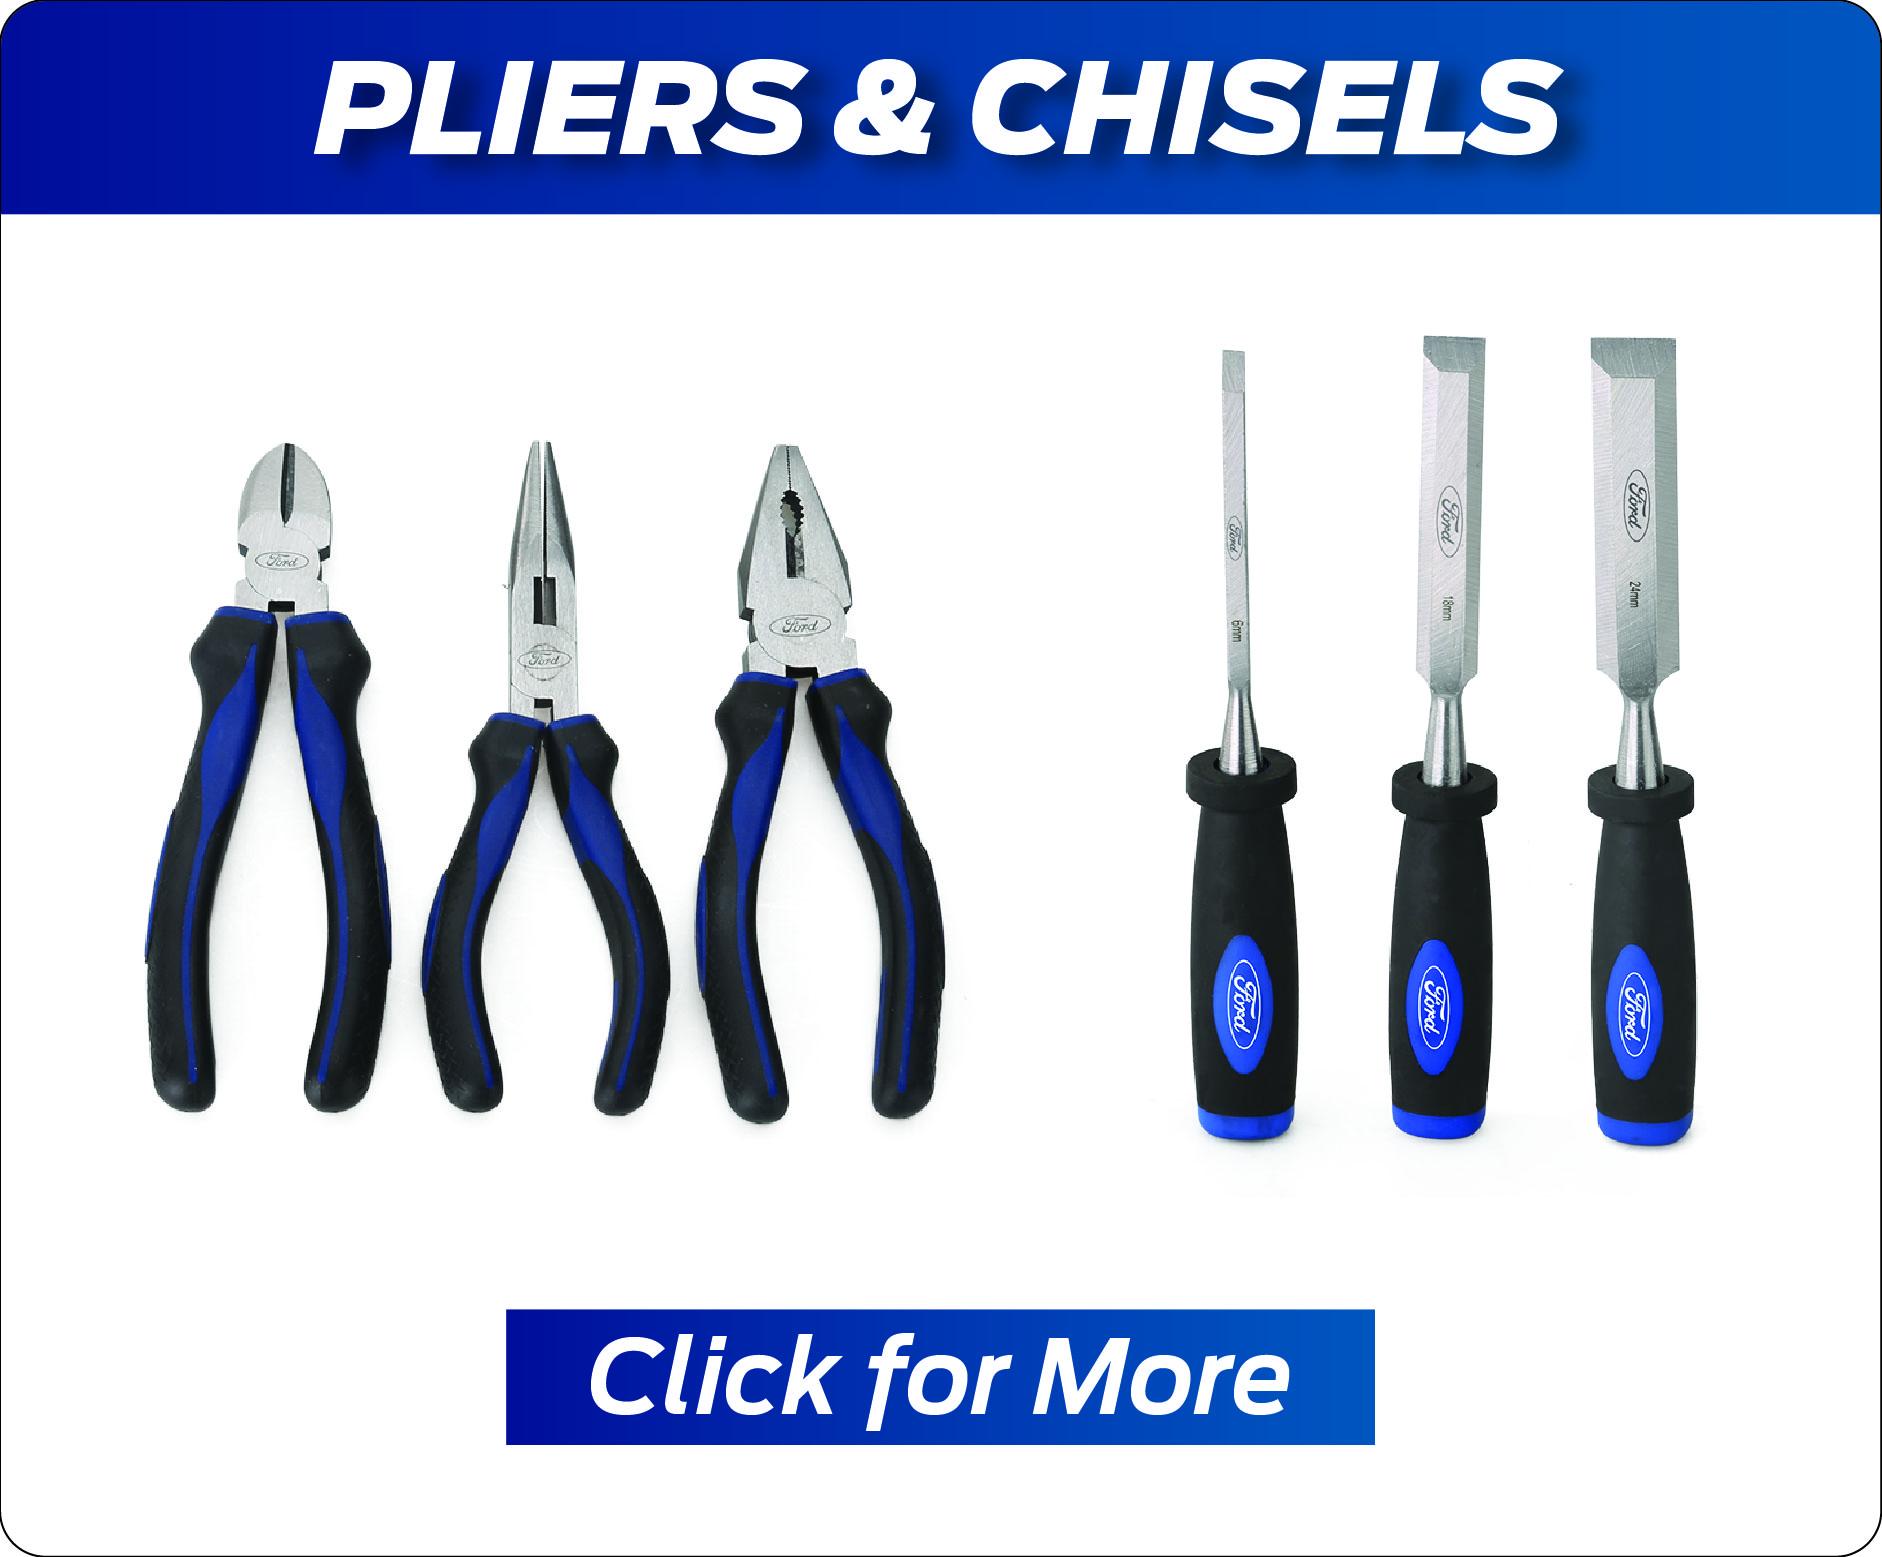 Pliers & Chisels